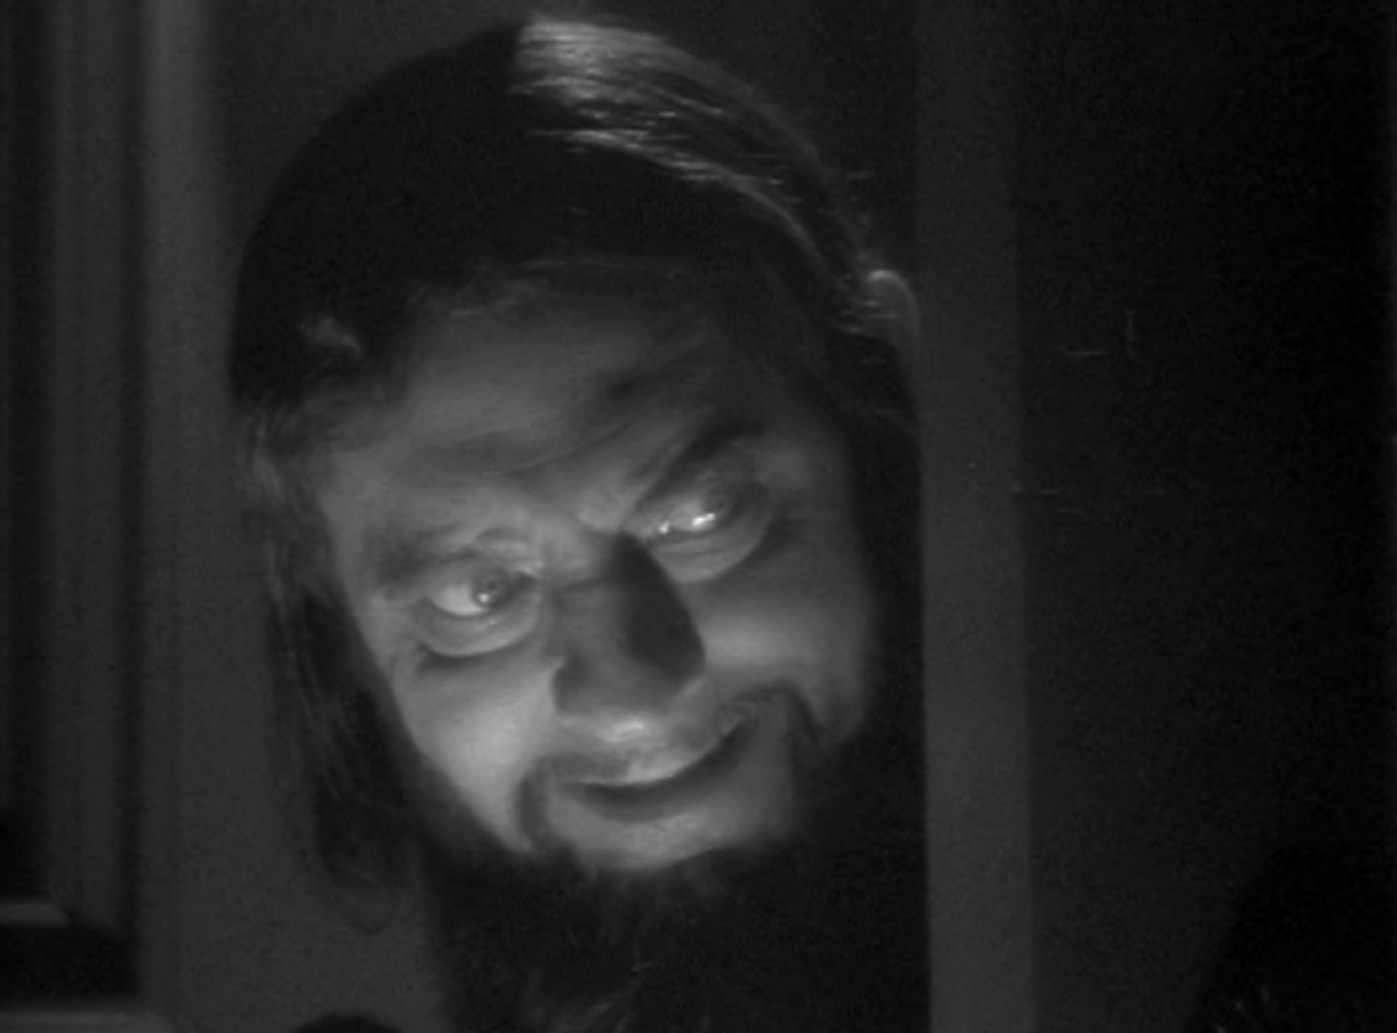 Pelicula Porno Rasputin rasputin and the empress (1932) review, with john, lionel